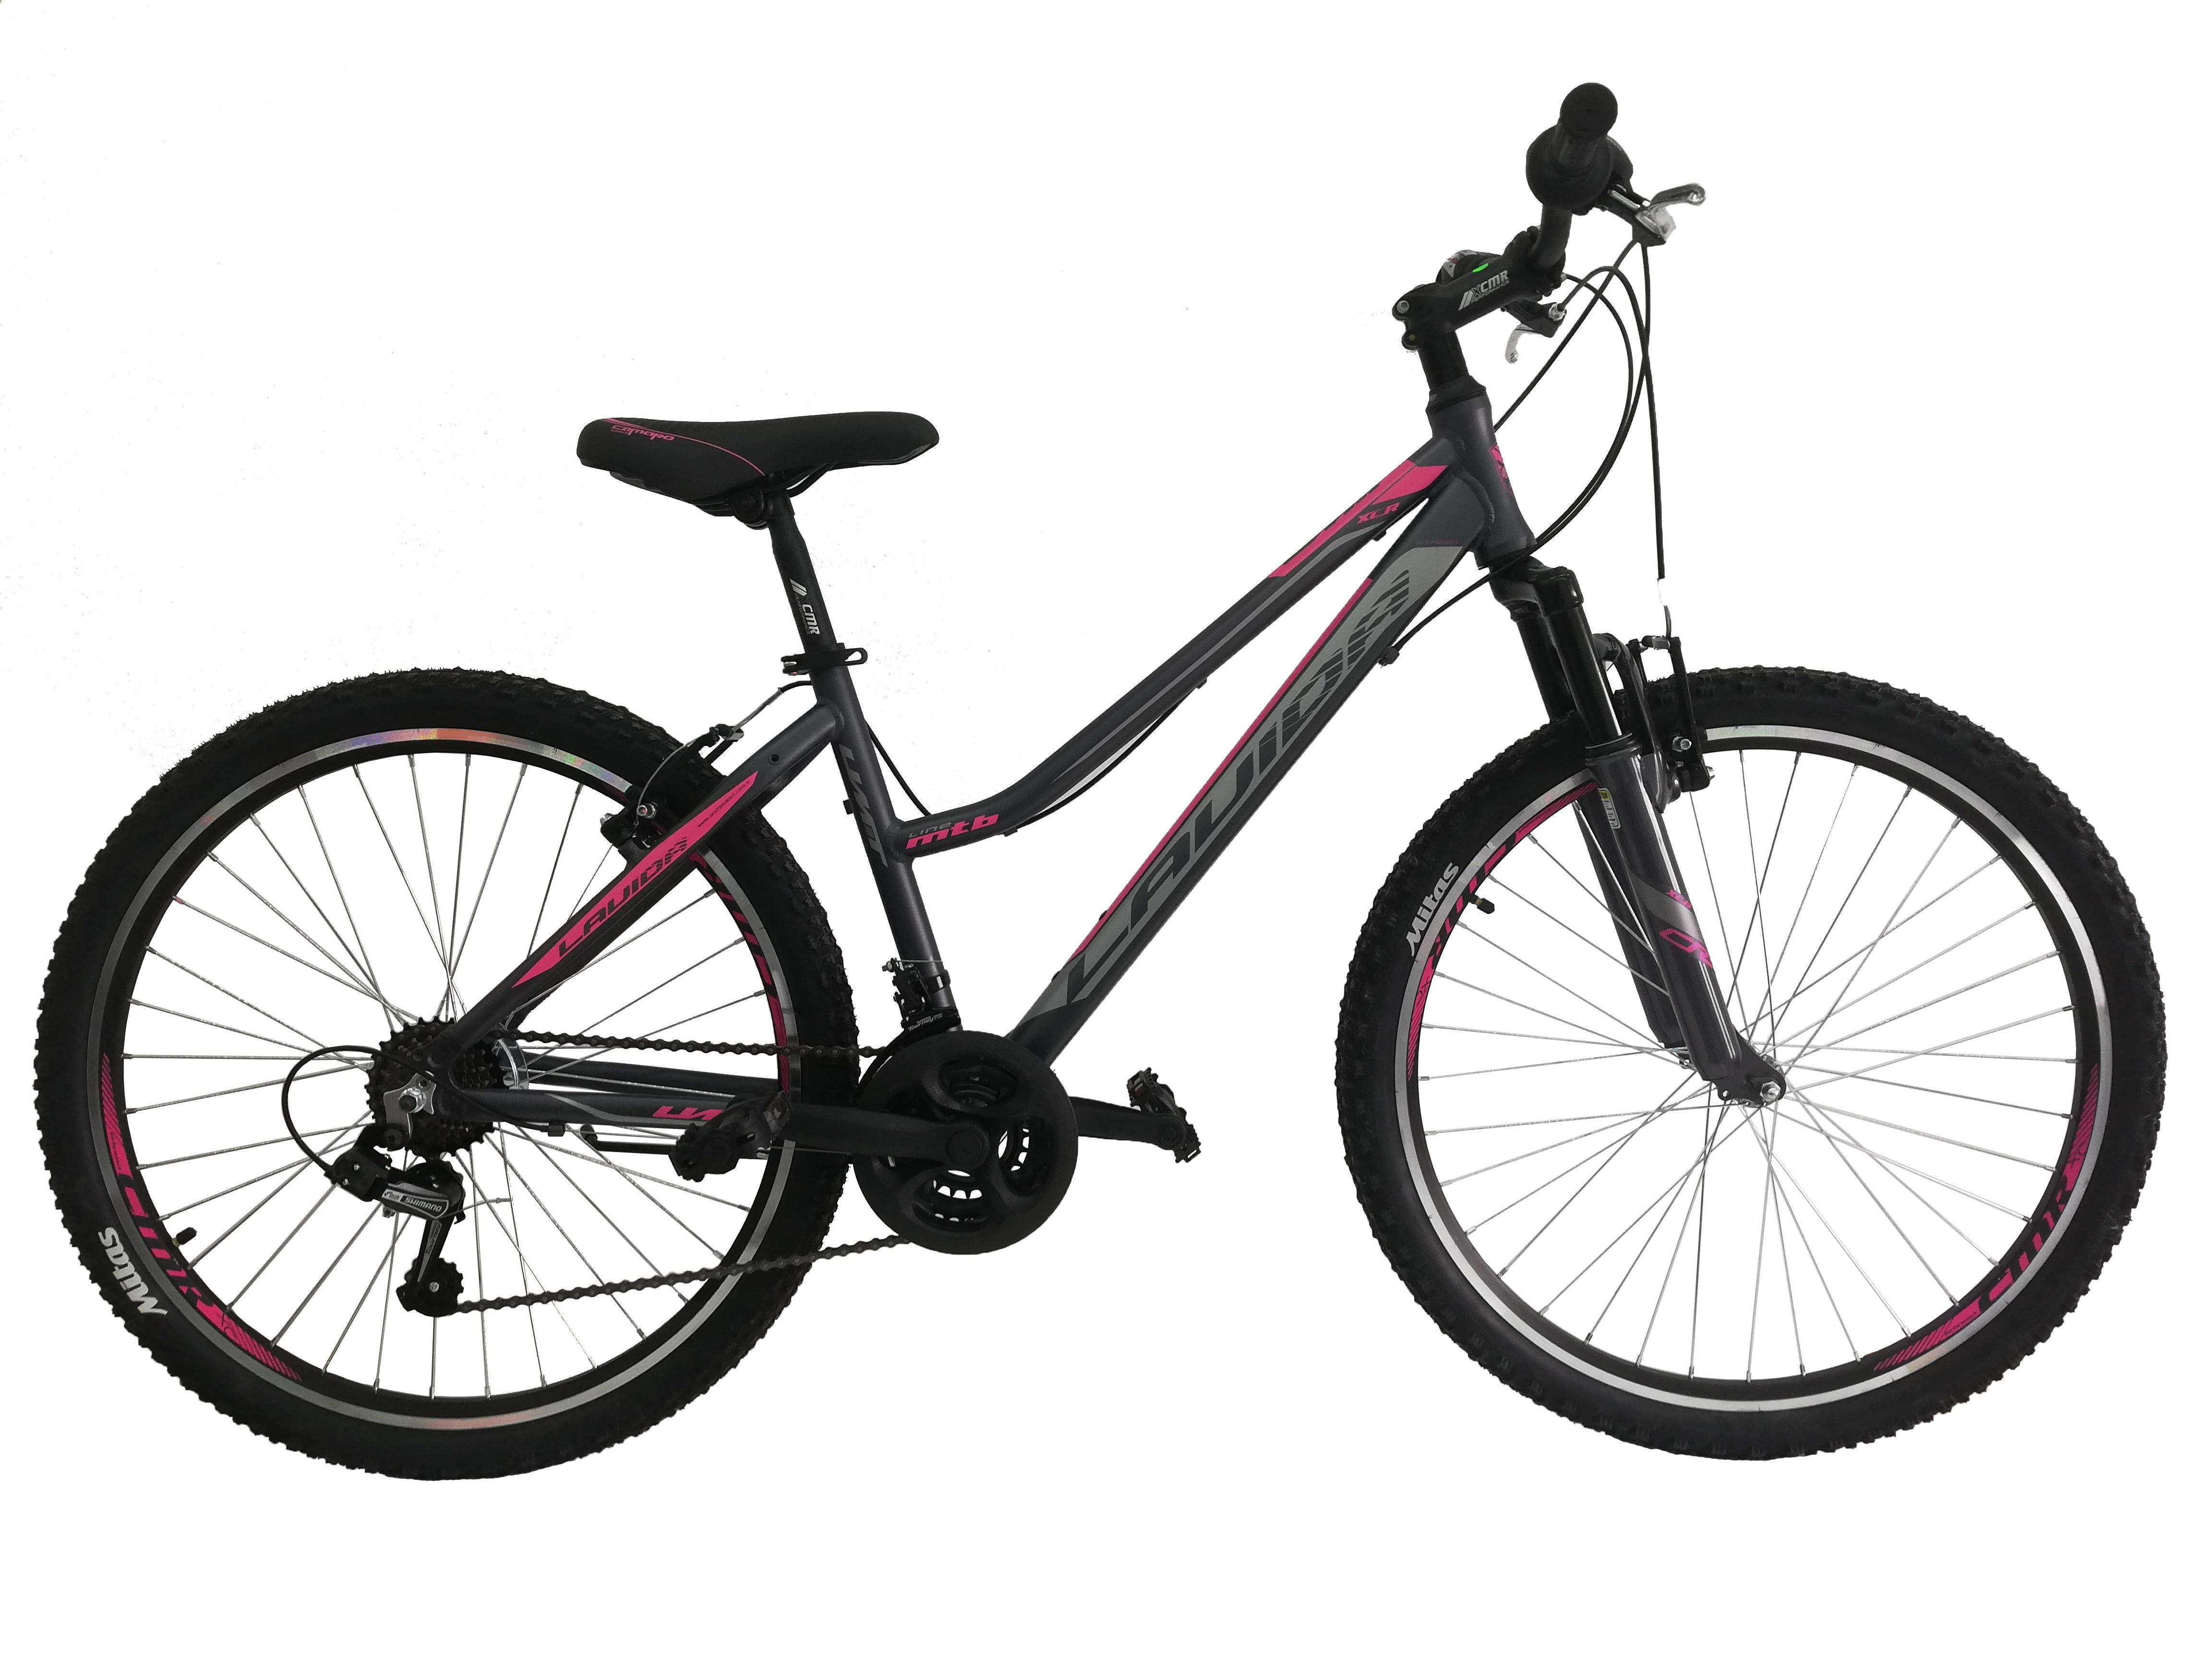 "Bicicleta MTB Umit Lavida Lady, Gri/Roz, Roata 26"", Cadru Aluminiu [0]"